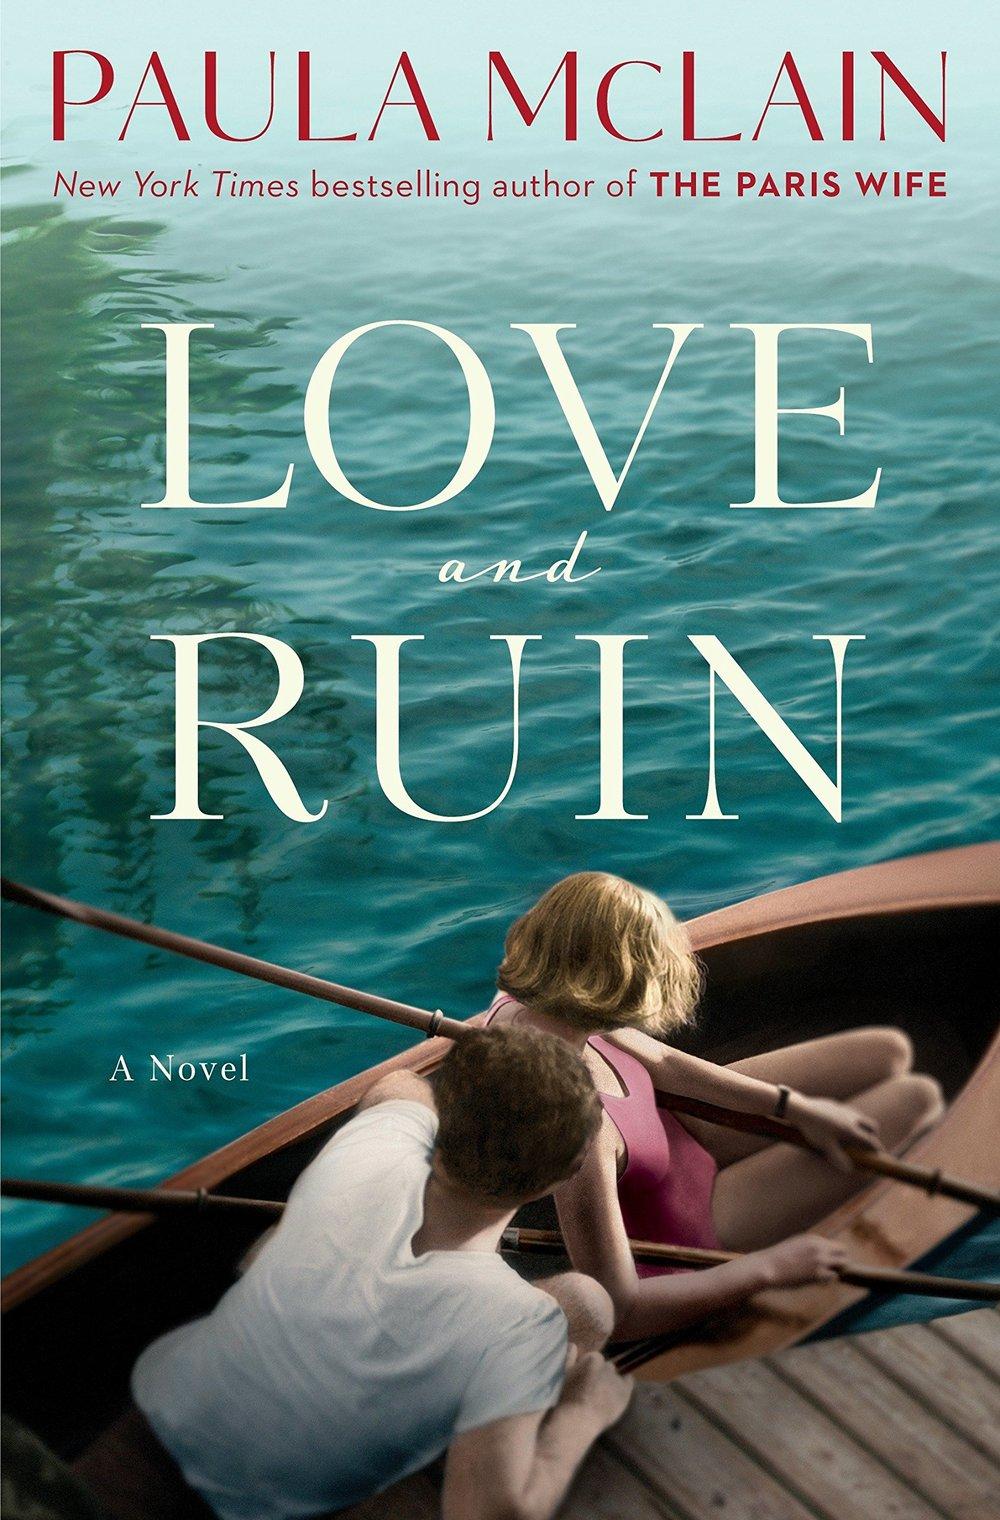 love and ruin by paula mclain.jpg